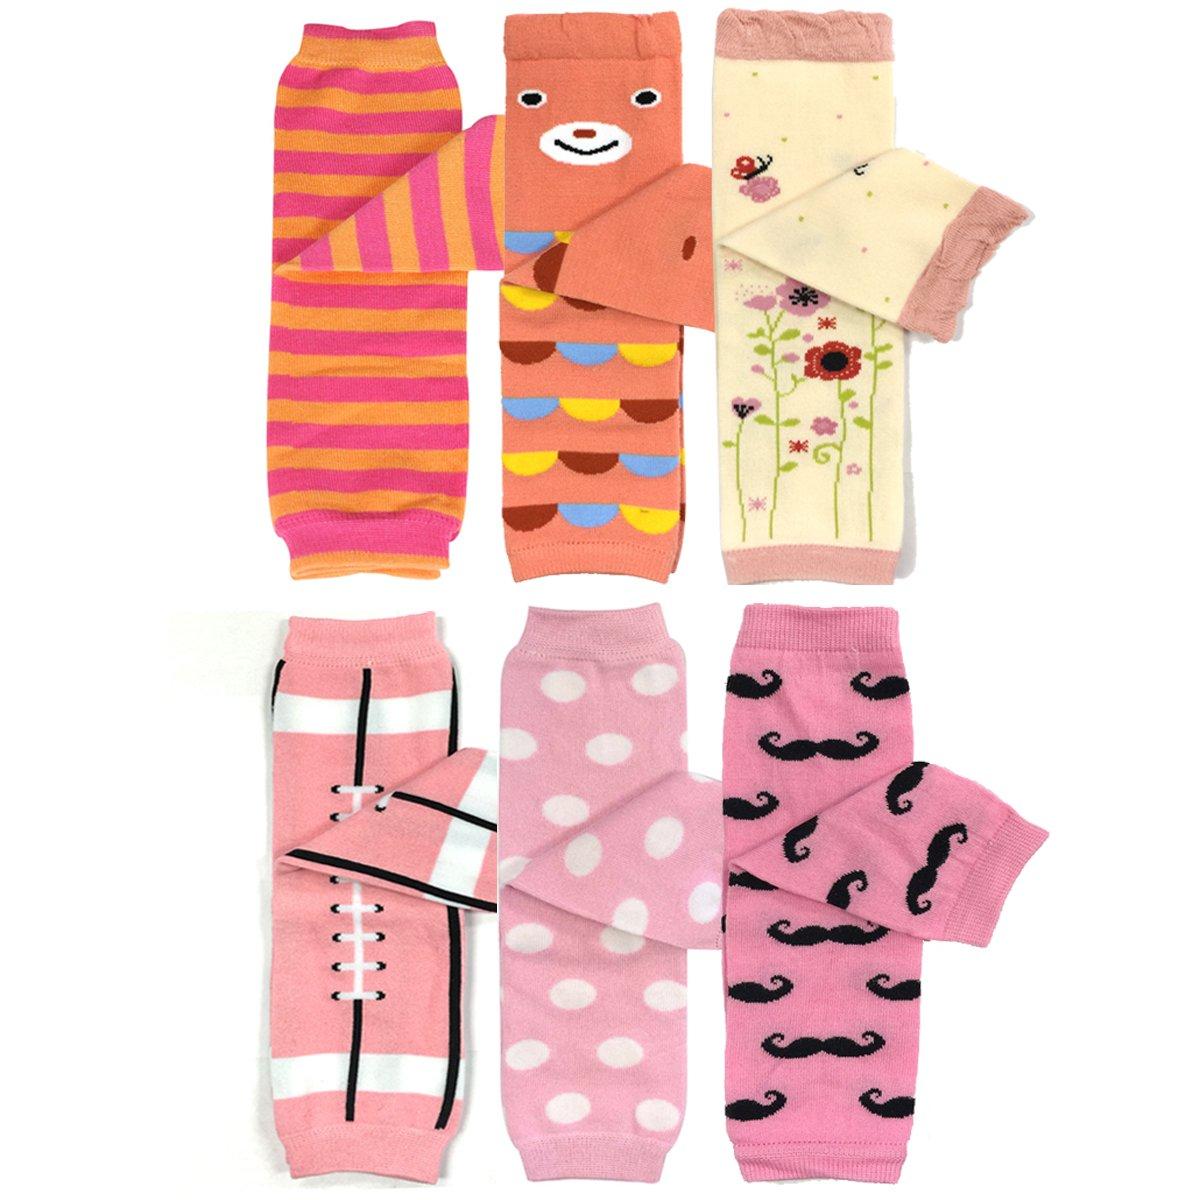 Bowbear Baby & Toddler Girls Set of 6 Assorted Leg Warmers, GS01 by Bowbear